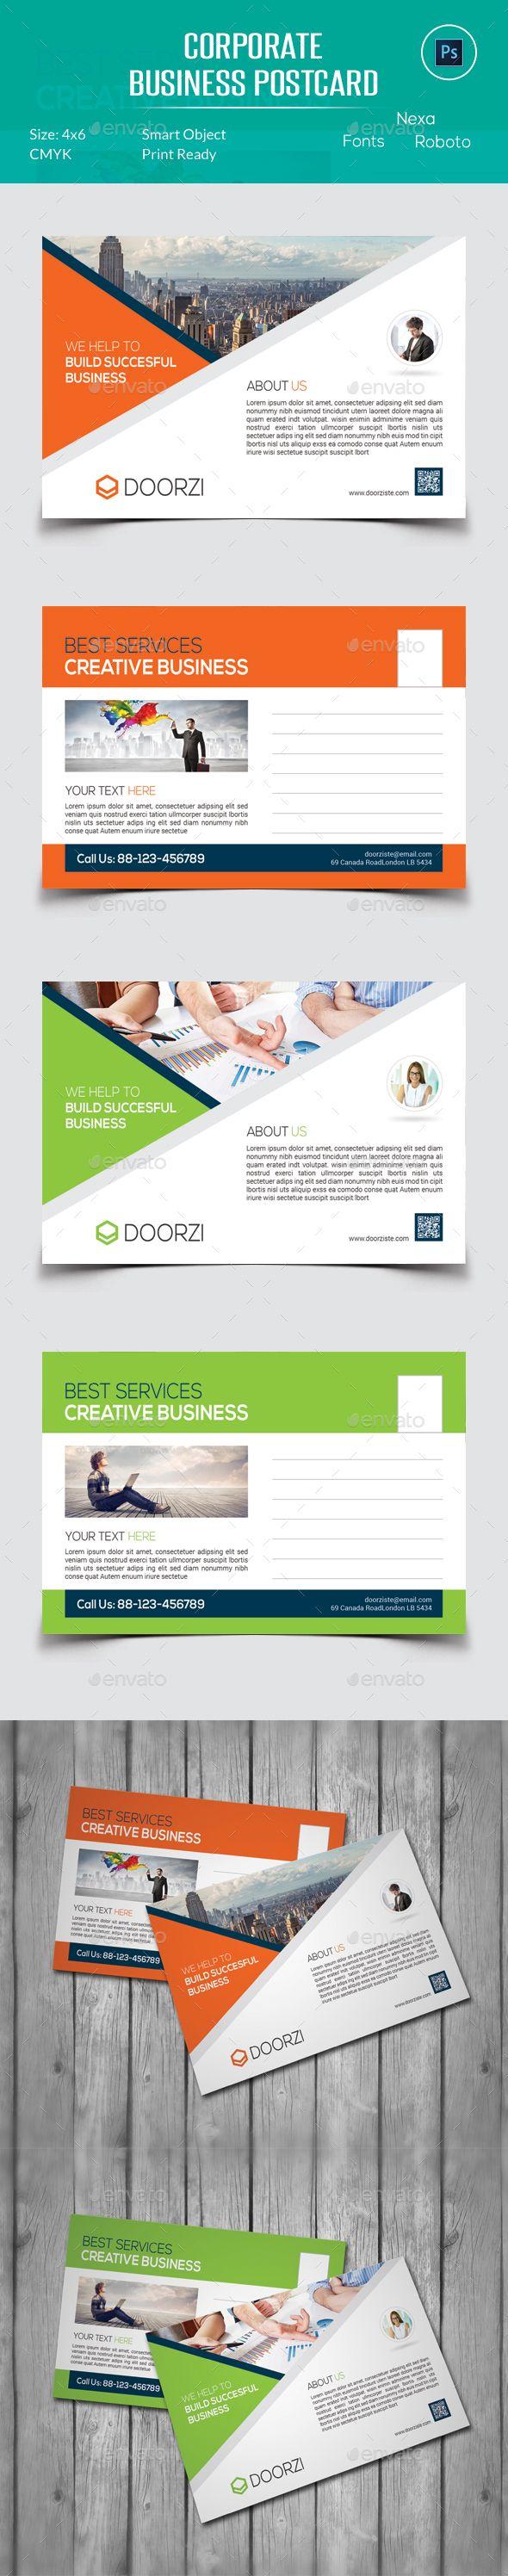 Corporate Business Postcard | Business postcards, Corporate business ...